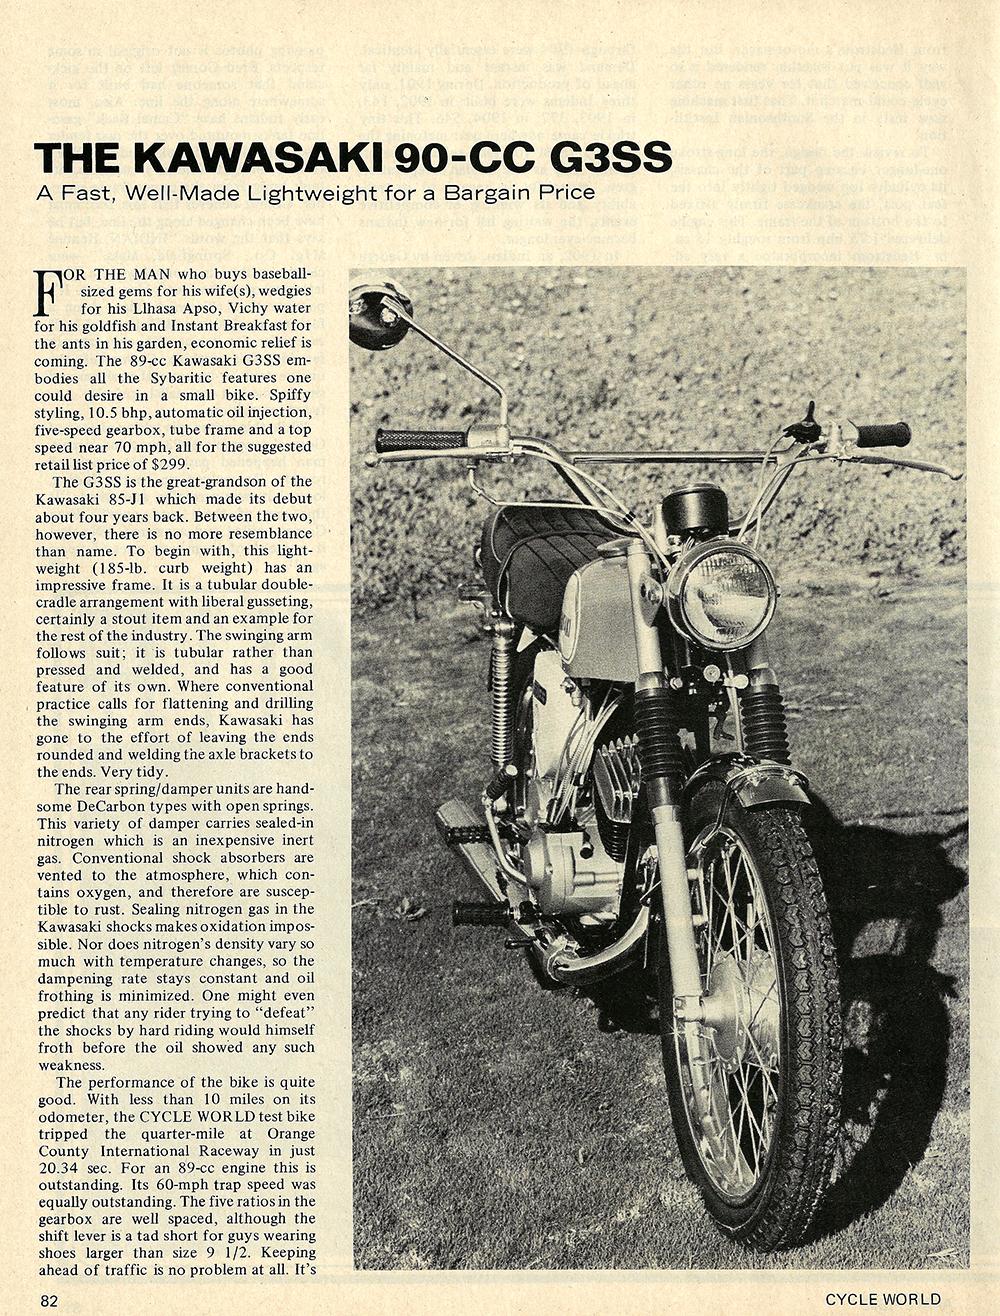 1969 Kawasaki G3SS 90 road test 01.jpg